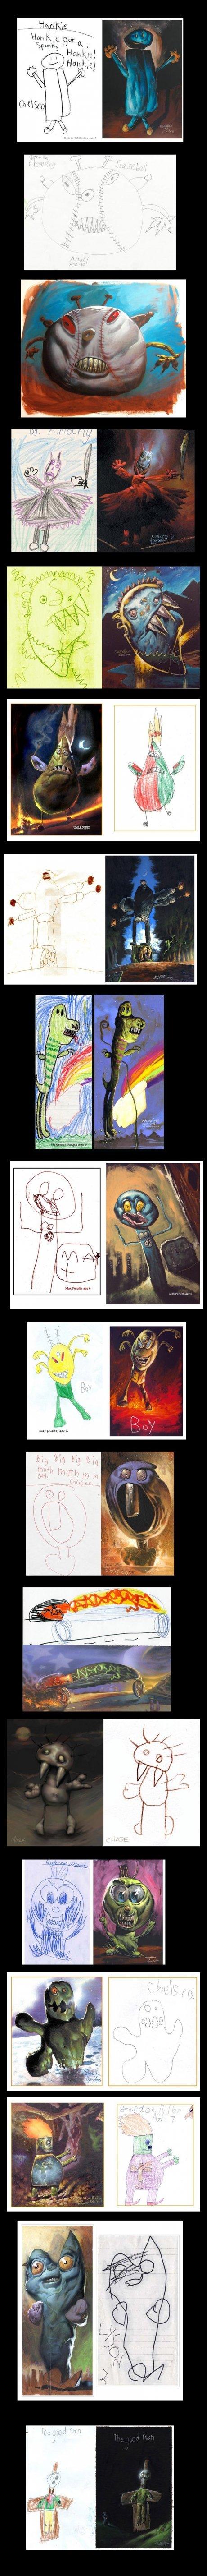 Nightmare Drawings. .. Who you callin' pinhead? Nightmare Drawings Who you callin' pinhead?